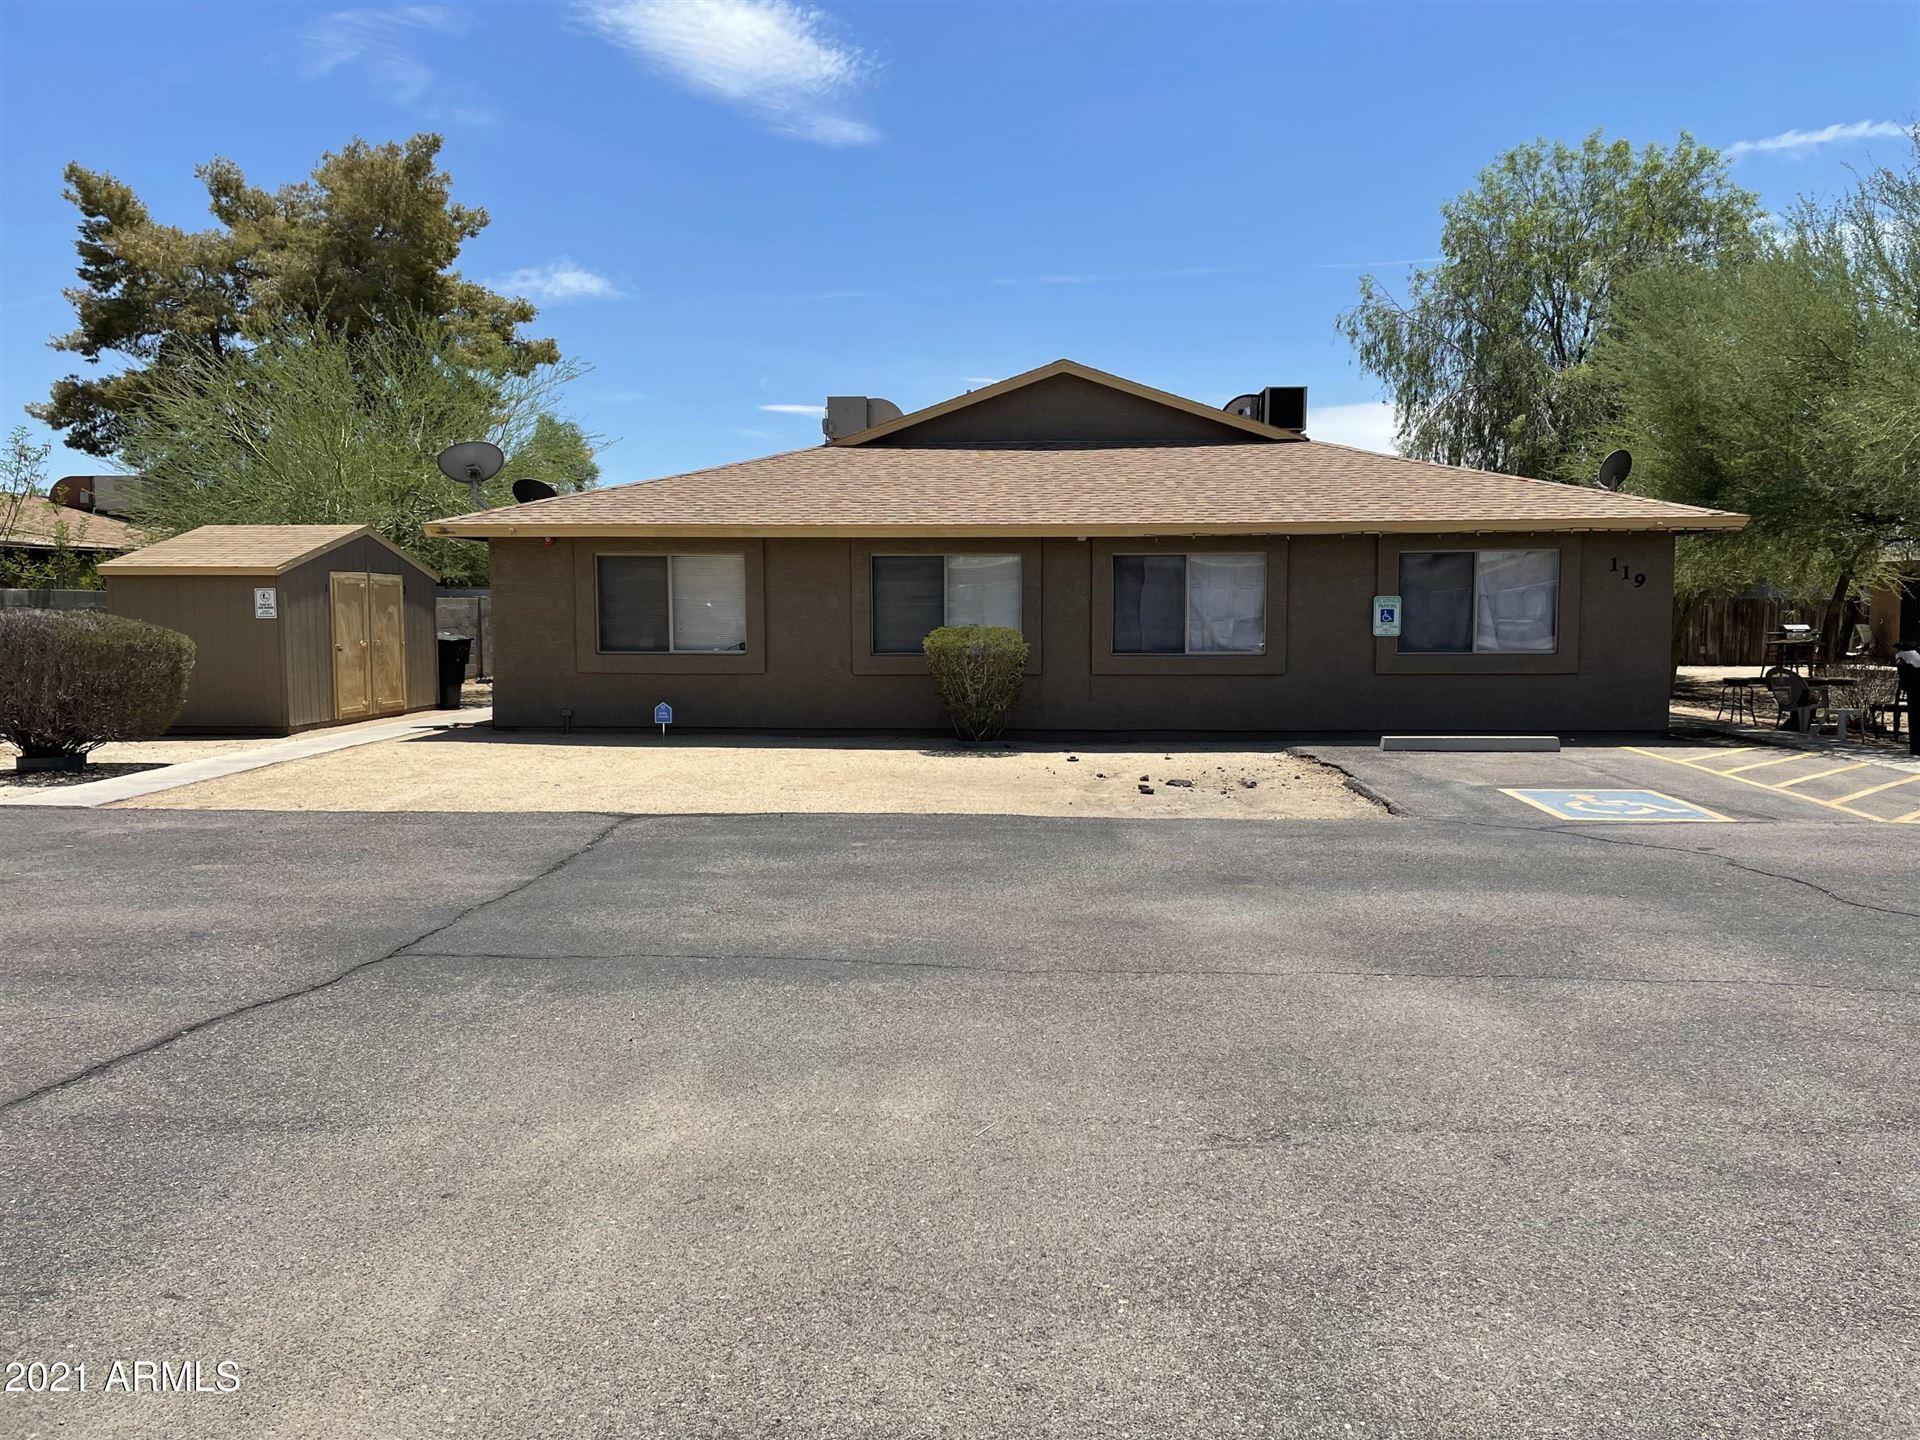 119 E INGRAM Street, Mesa, AZ 85201 - MLS#: 6268695